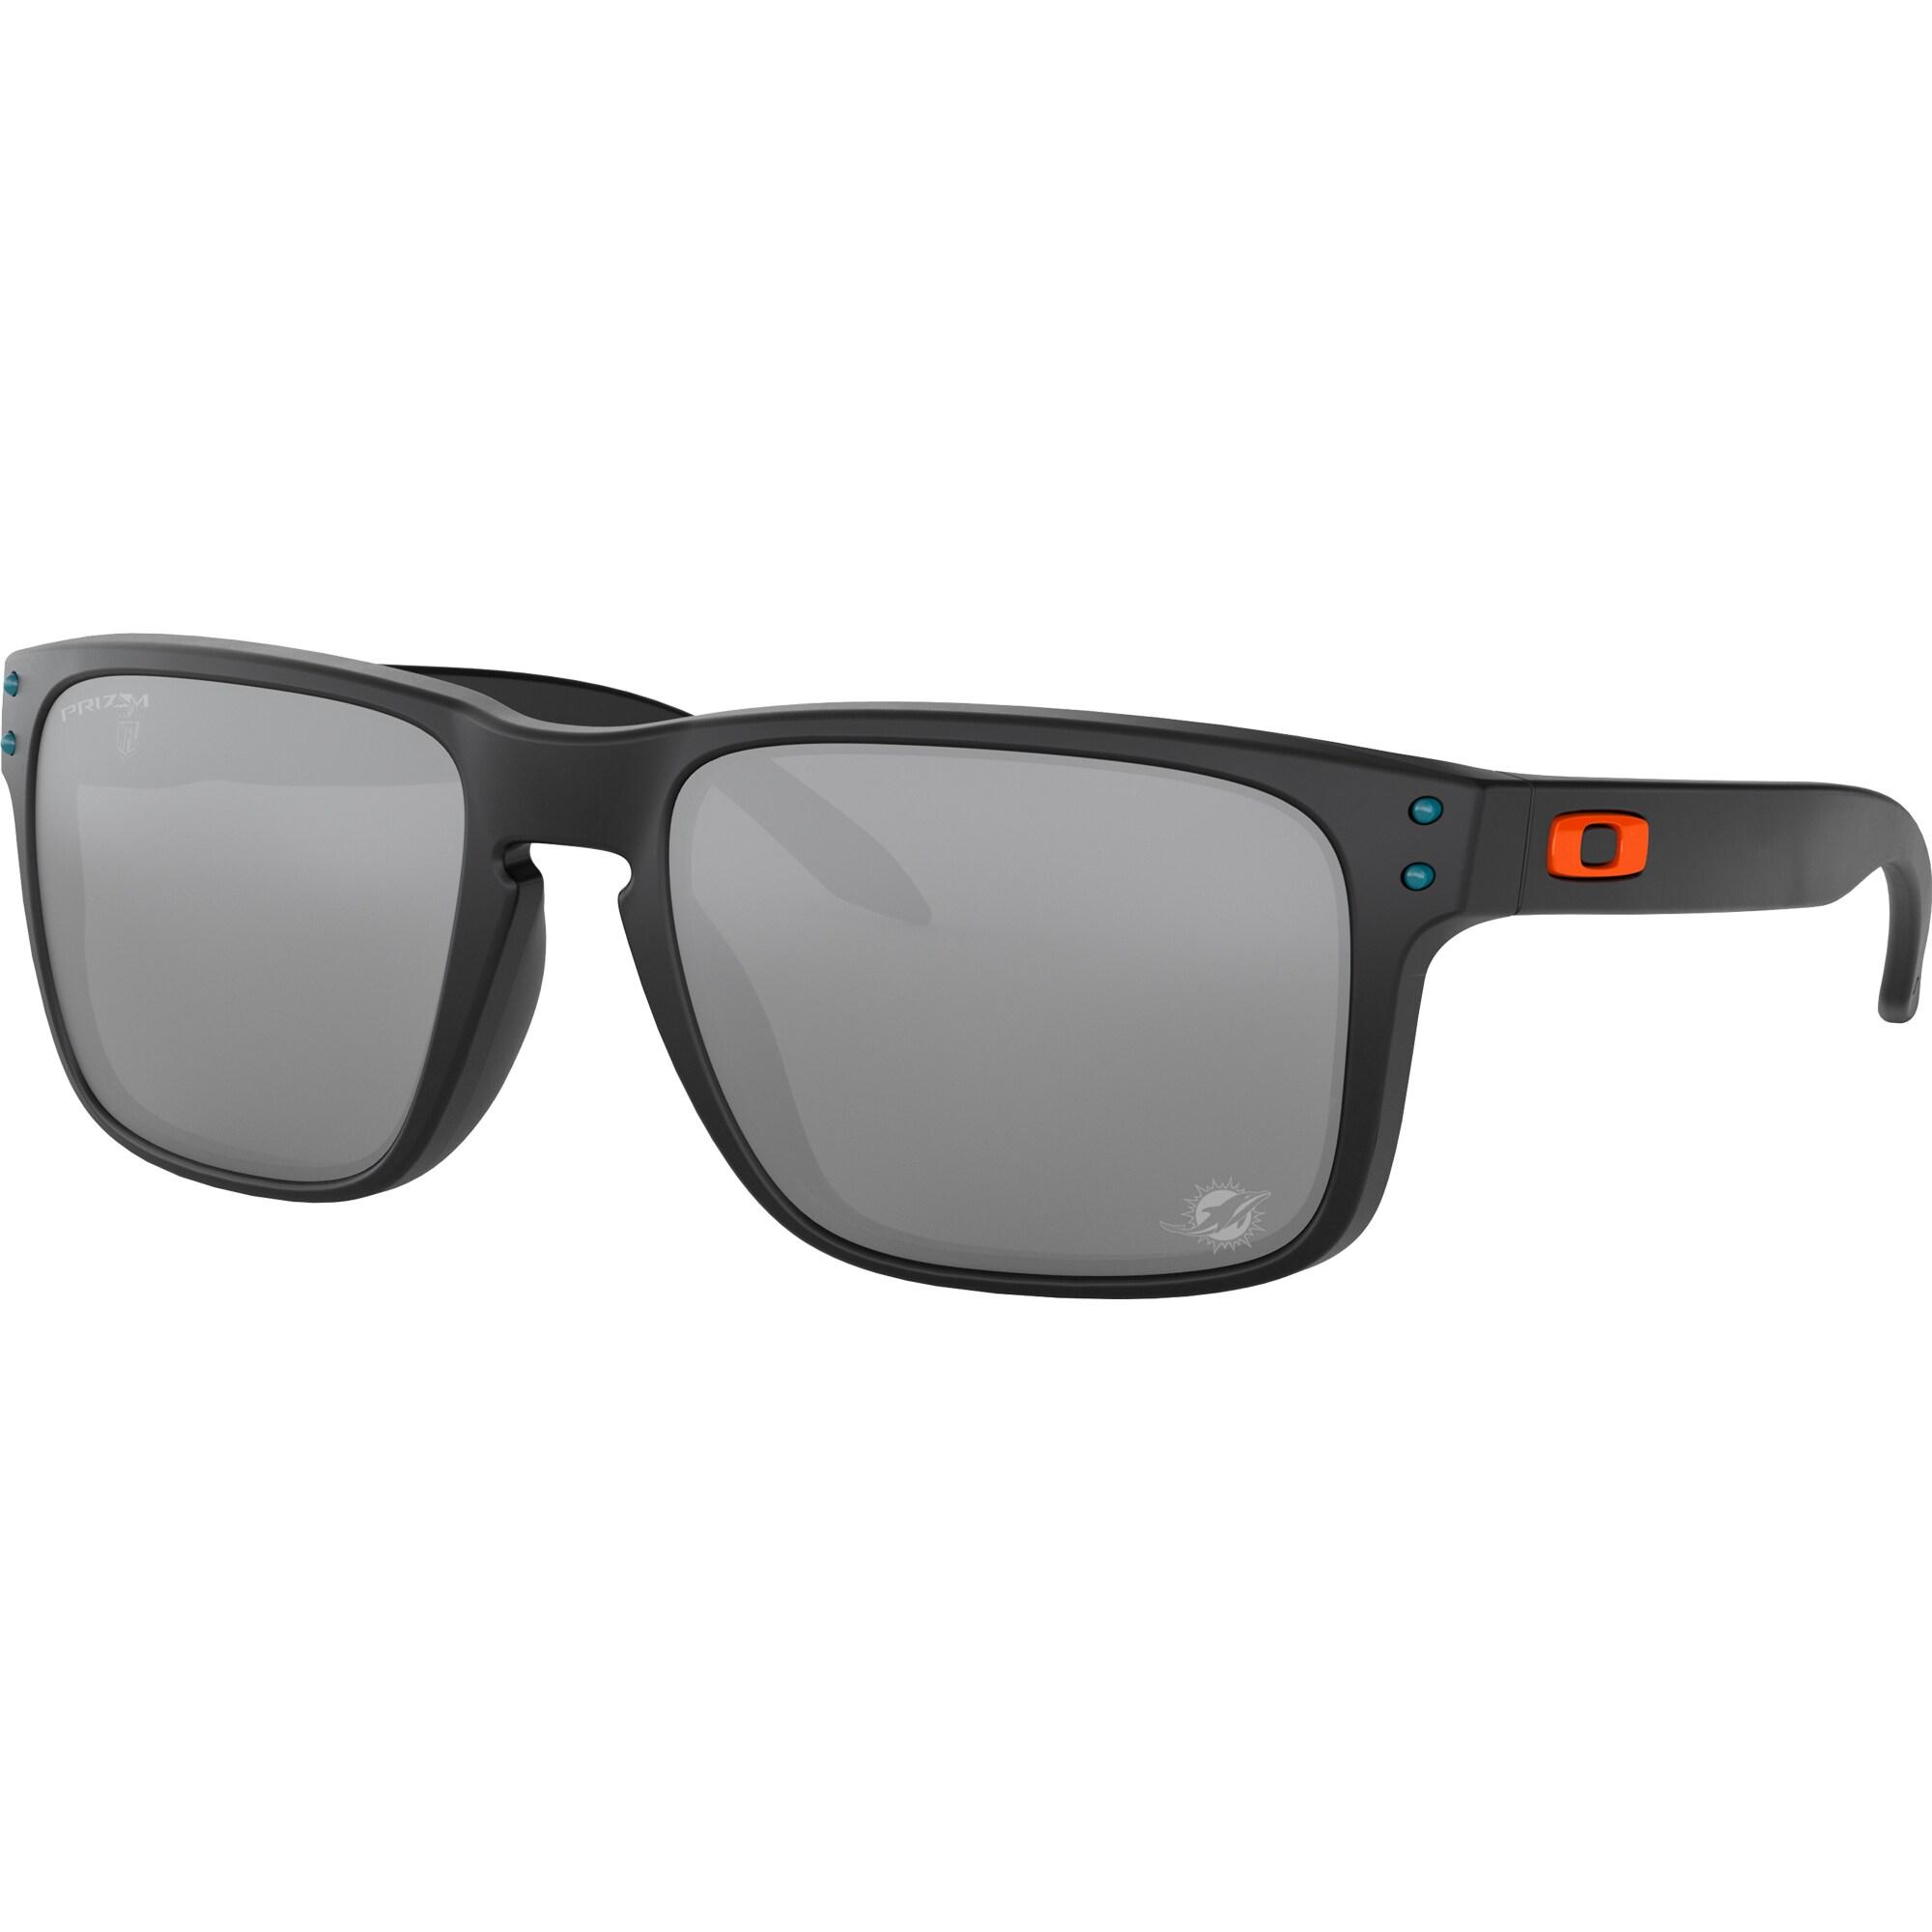 Miami Dolphins Oakley Holbrook Sunglasses